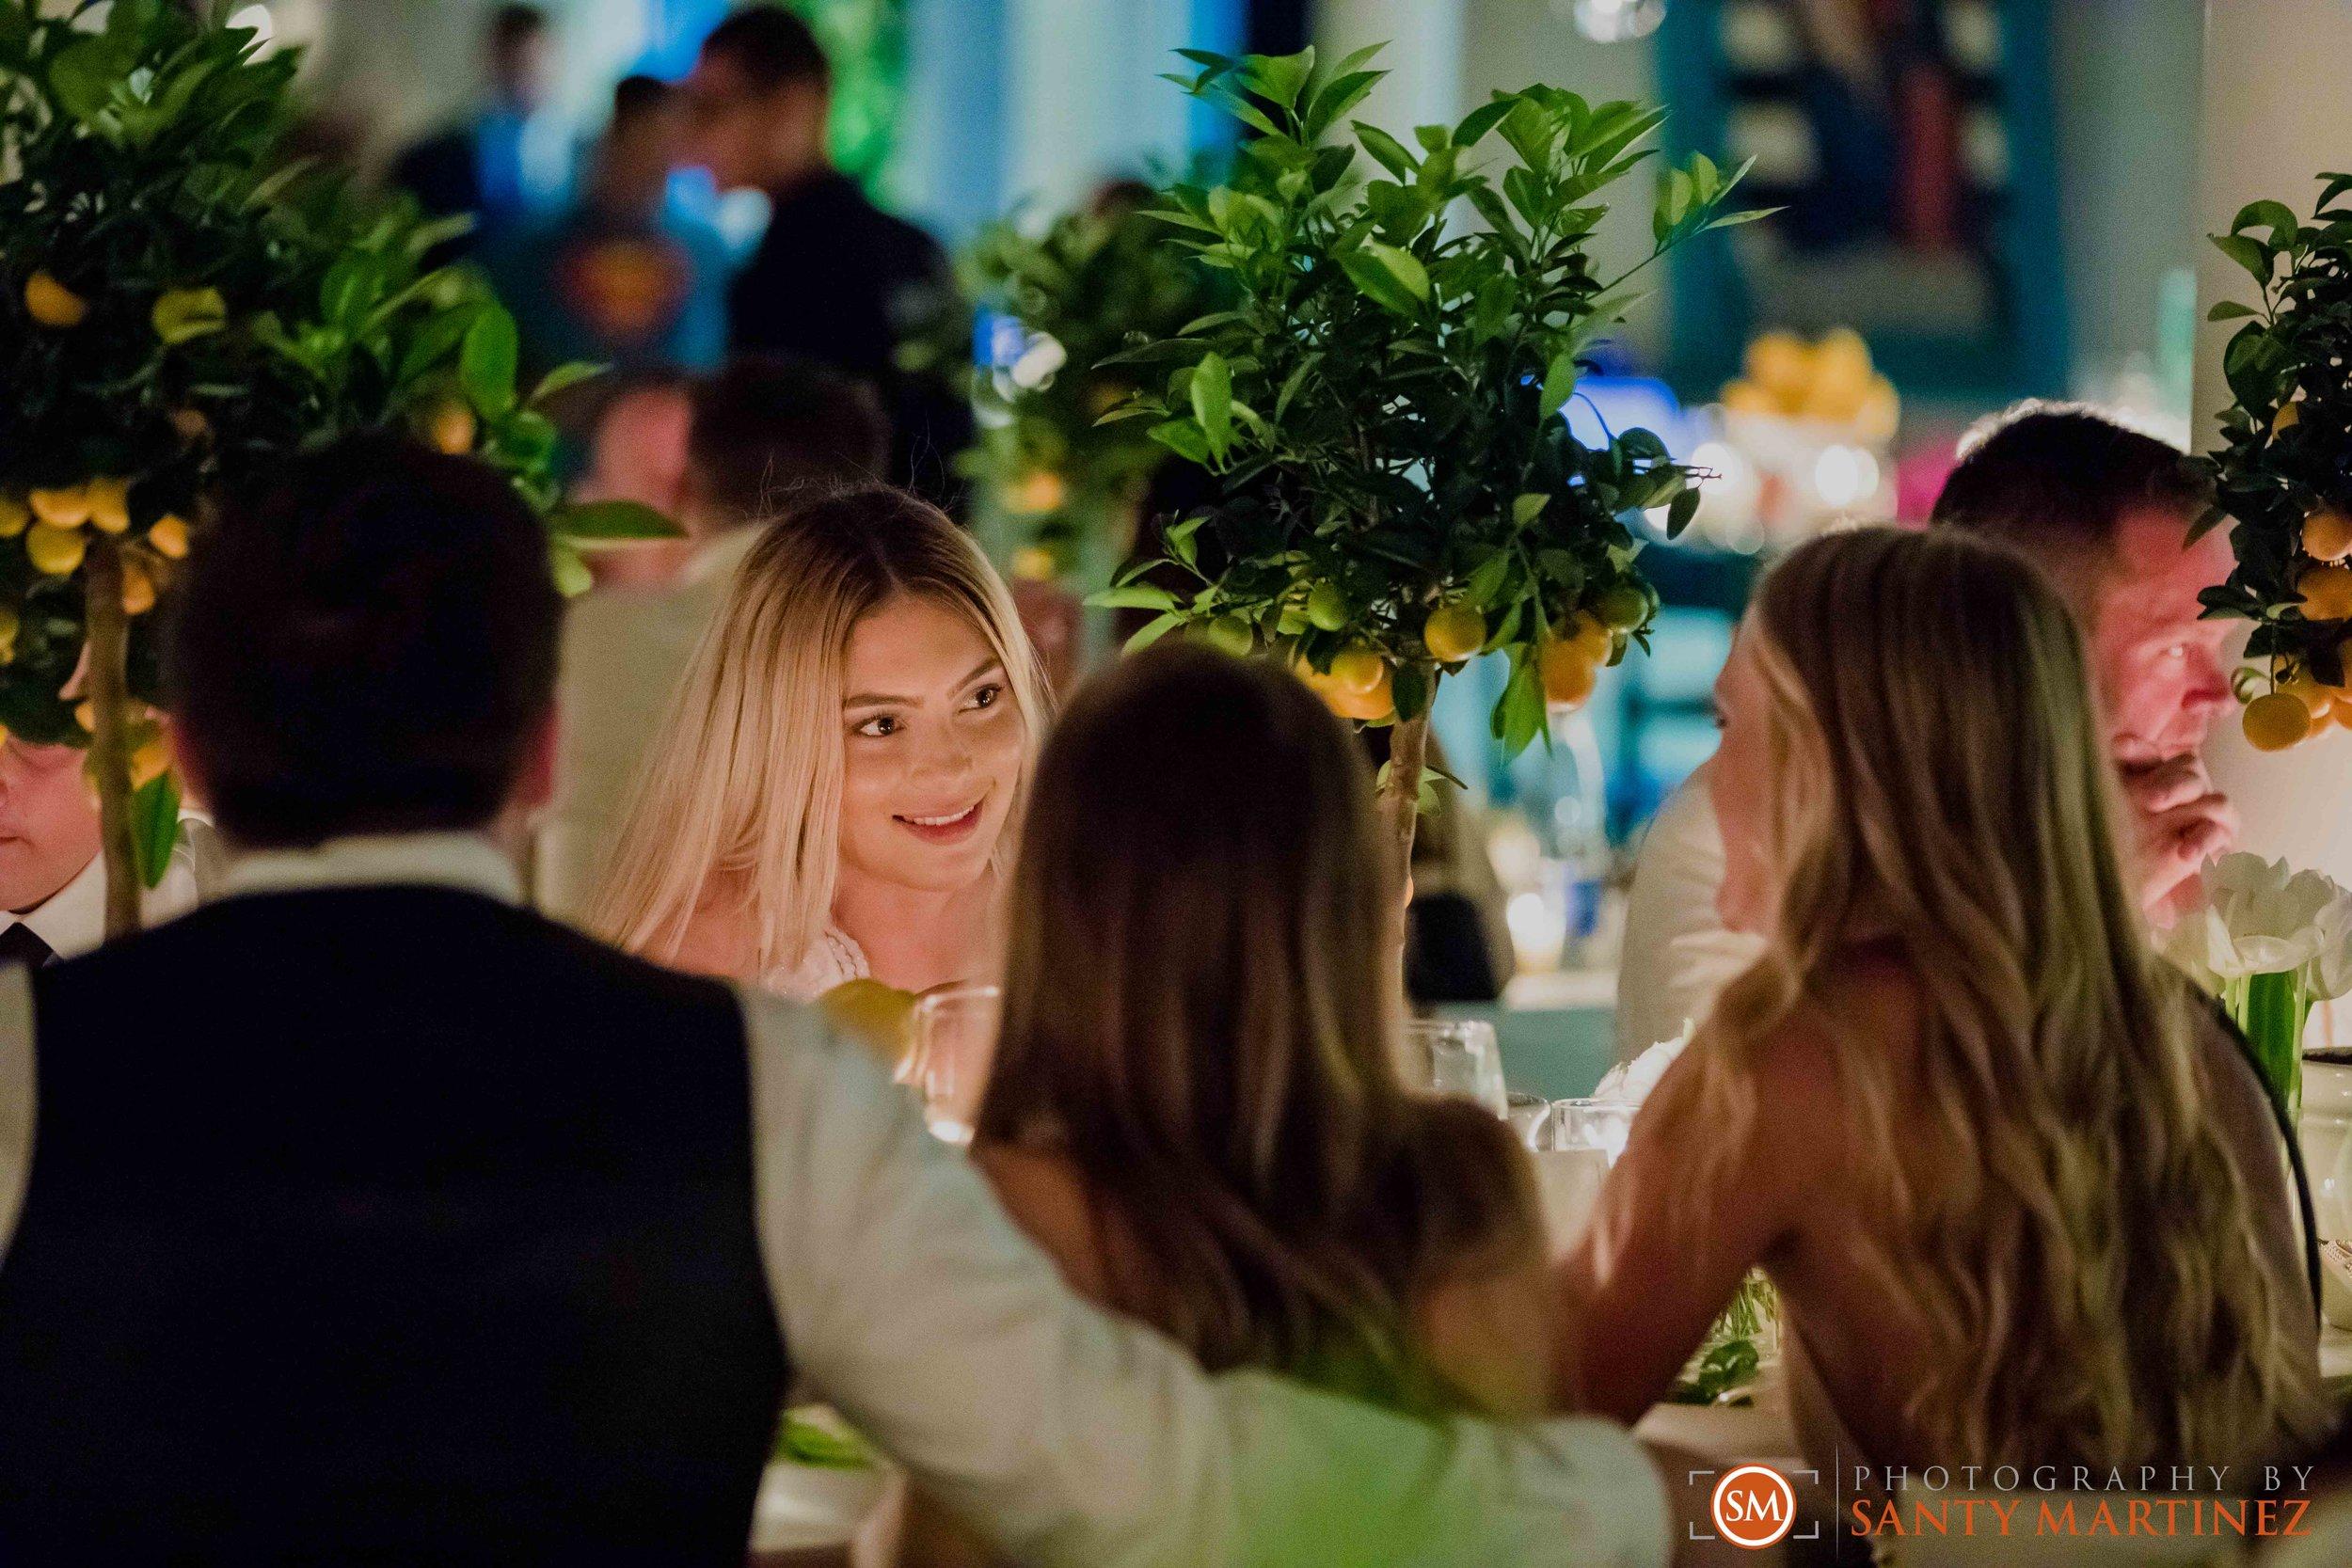 Wedding Capri Italy - Photography by Santy Martinez-71.jpg